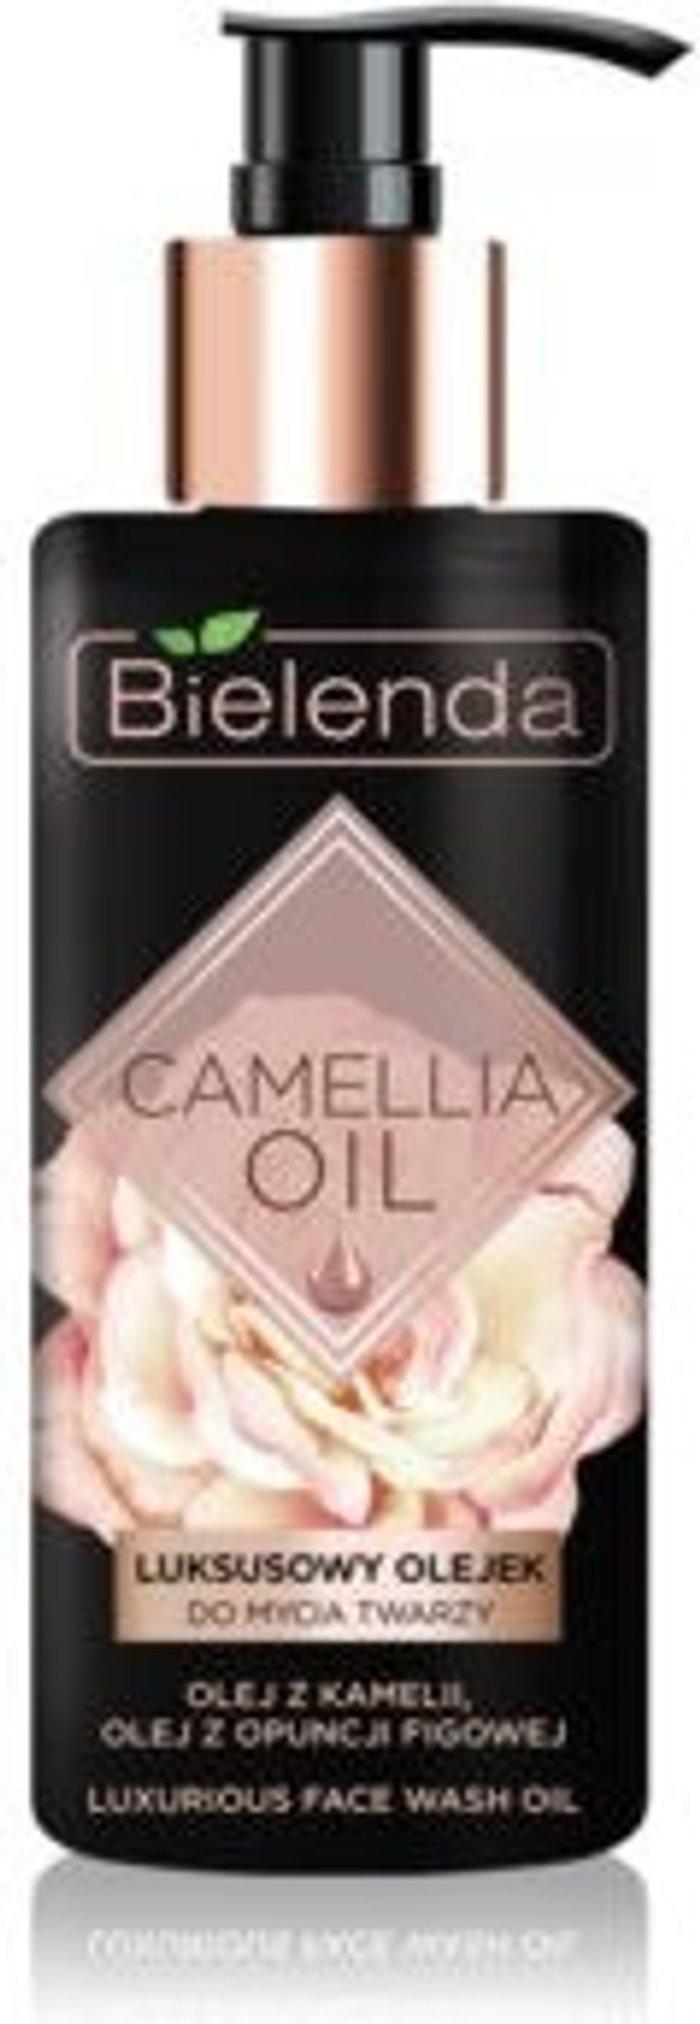 Bielenda Bielenda Camellia Oil bath oil for the face (140ml)